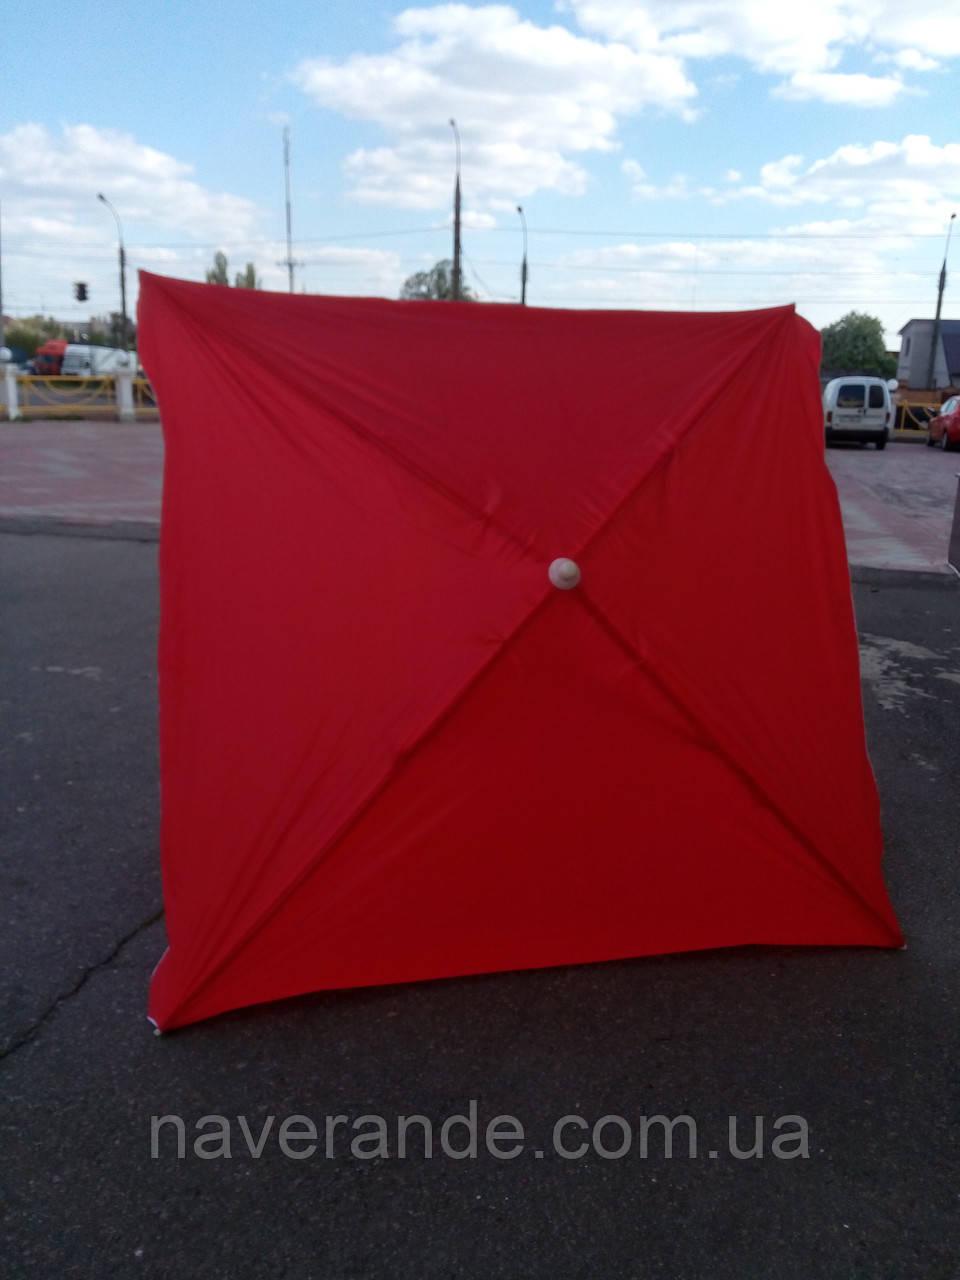 Квадратный пляжный зонт от солнца (красный 2х2 м)